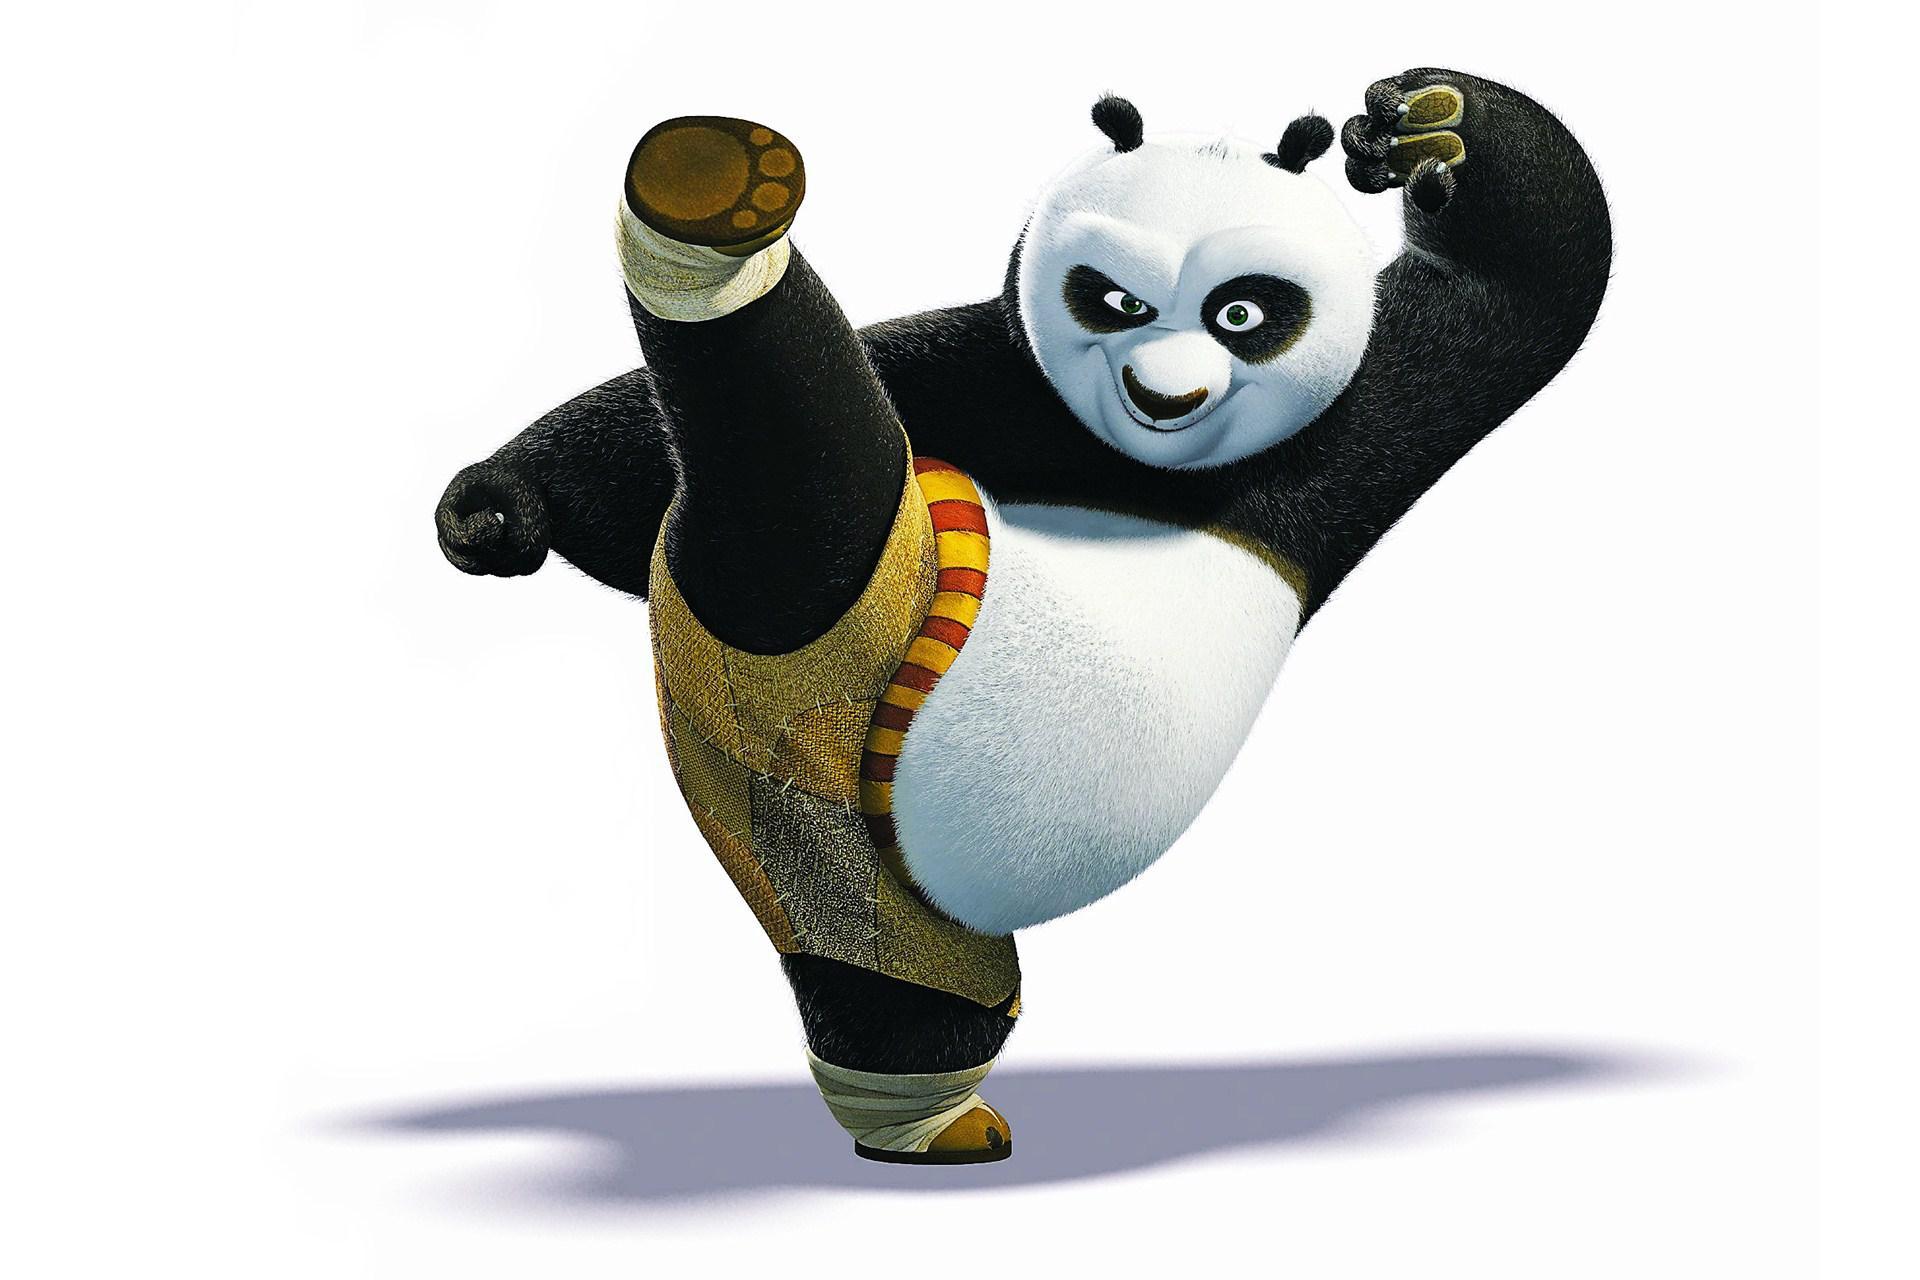 1920x1280px Kung Fu Panda Hd Wallpaper Wallpapersafari